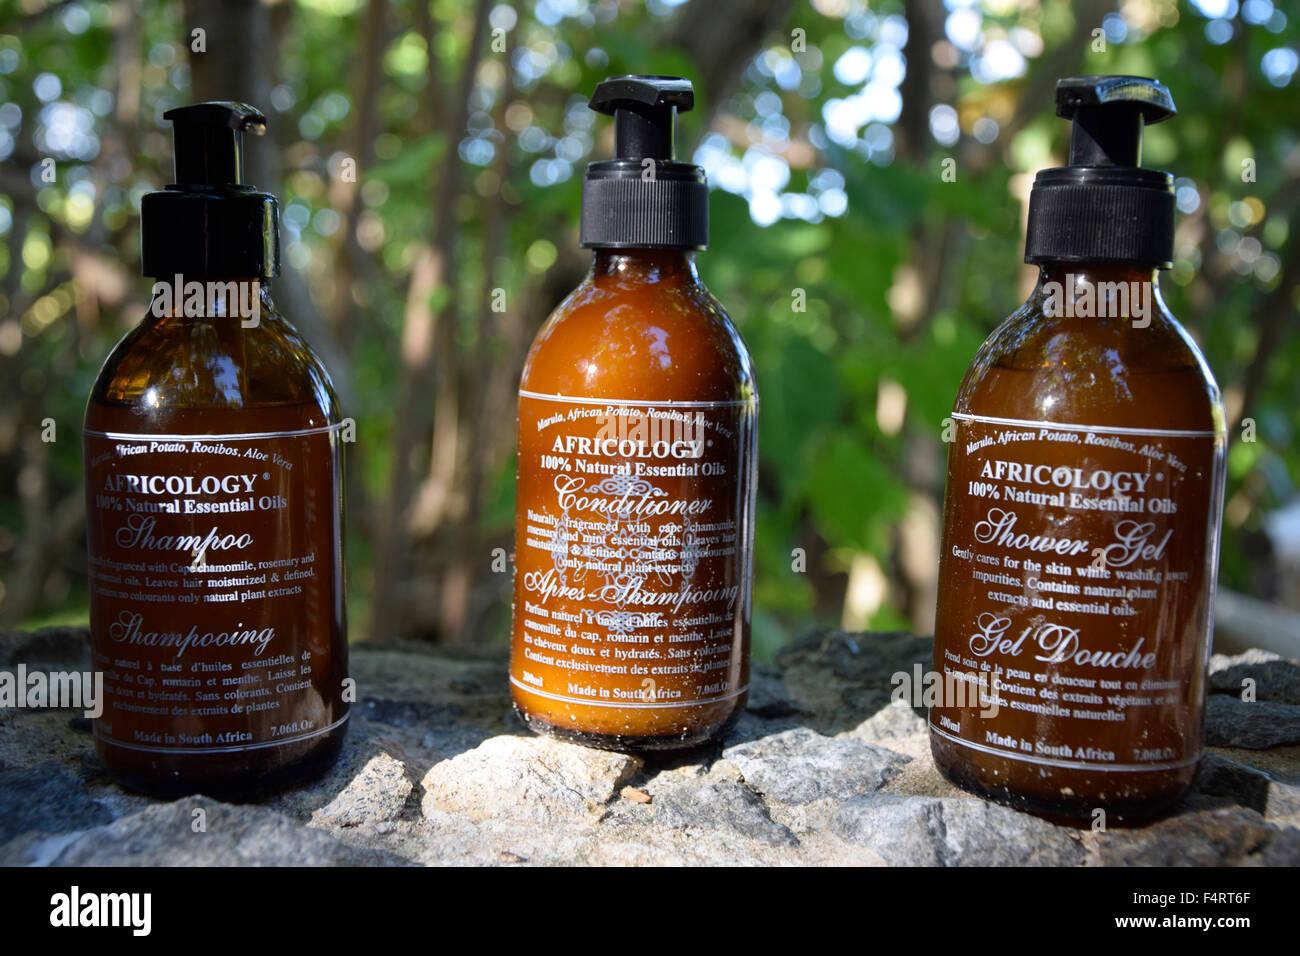 Shower gel, North Island, Seychelles, Africa, bottles, - Stock Image